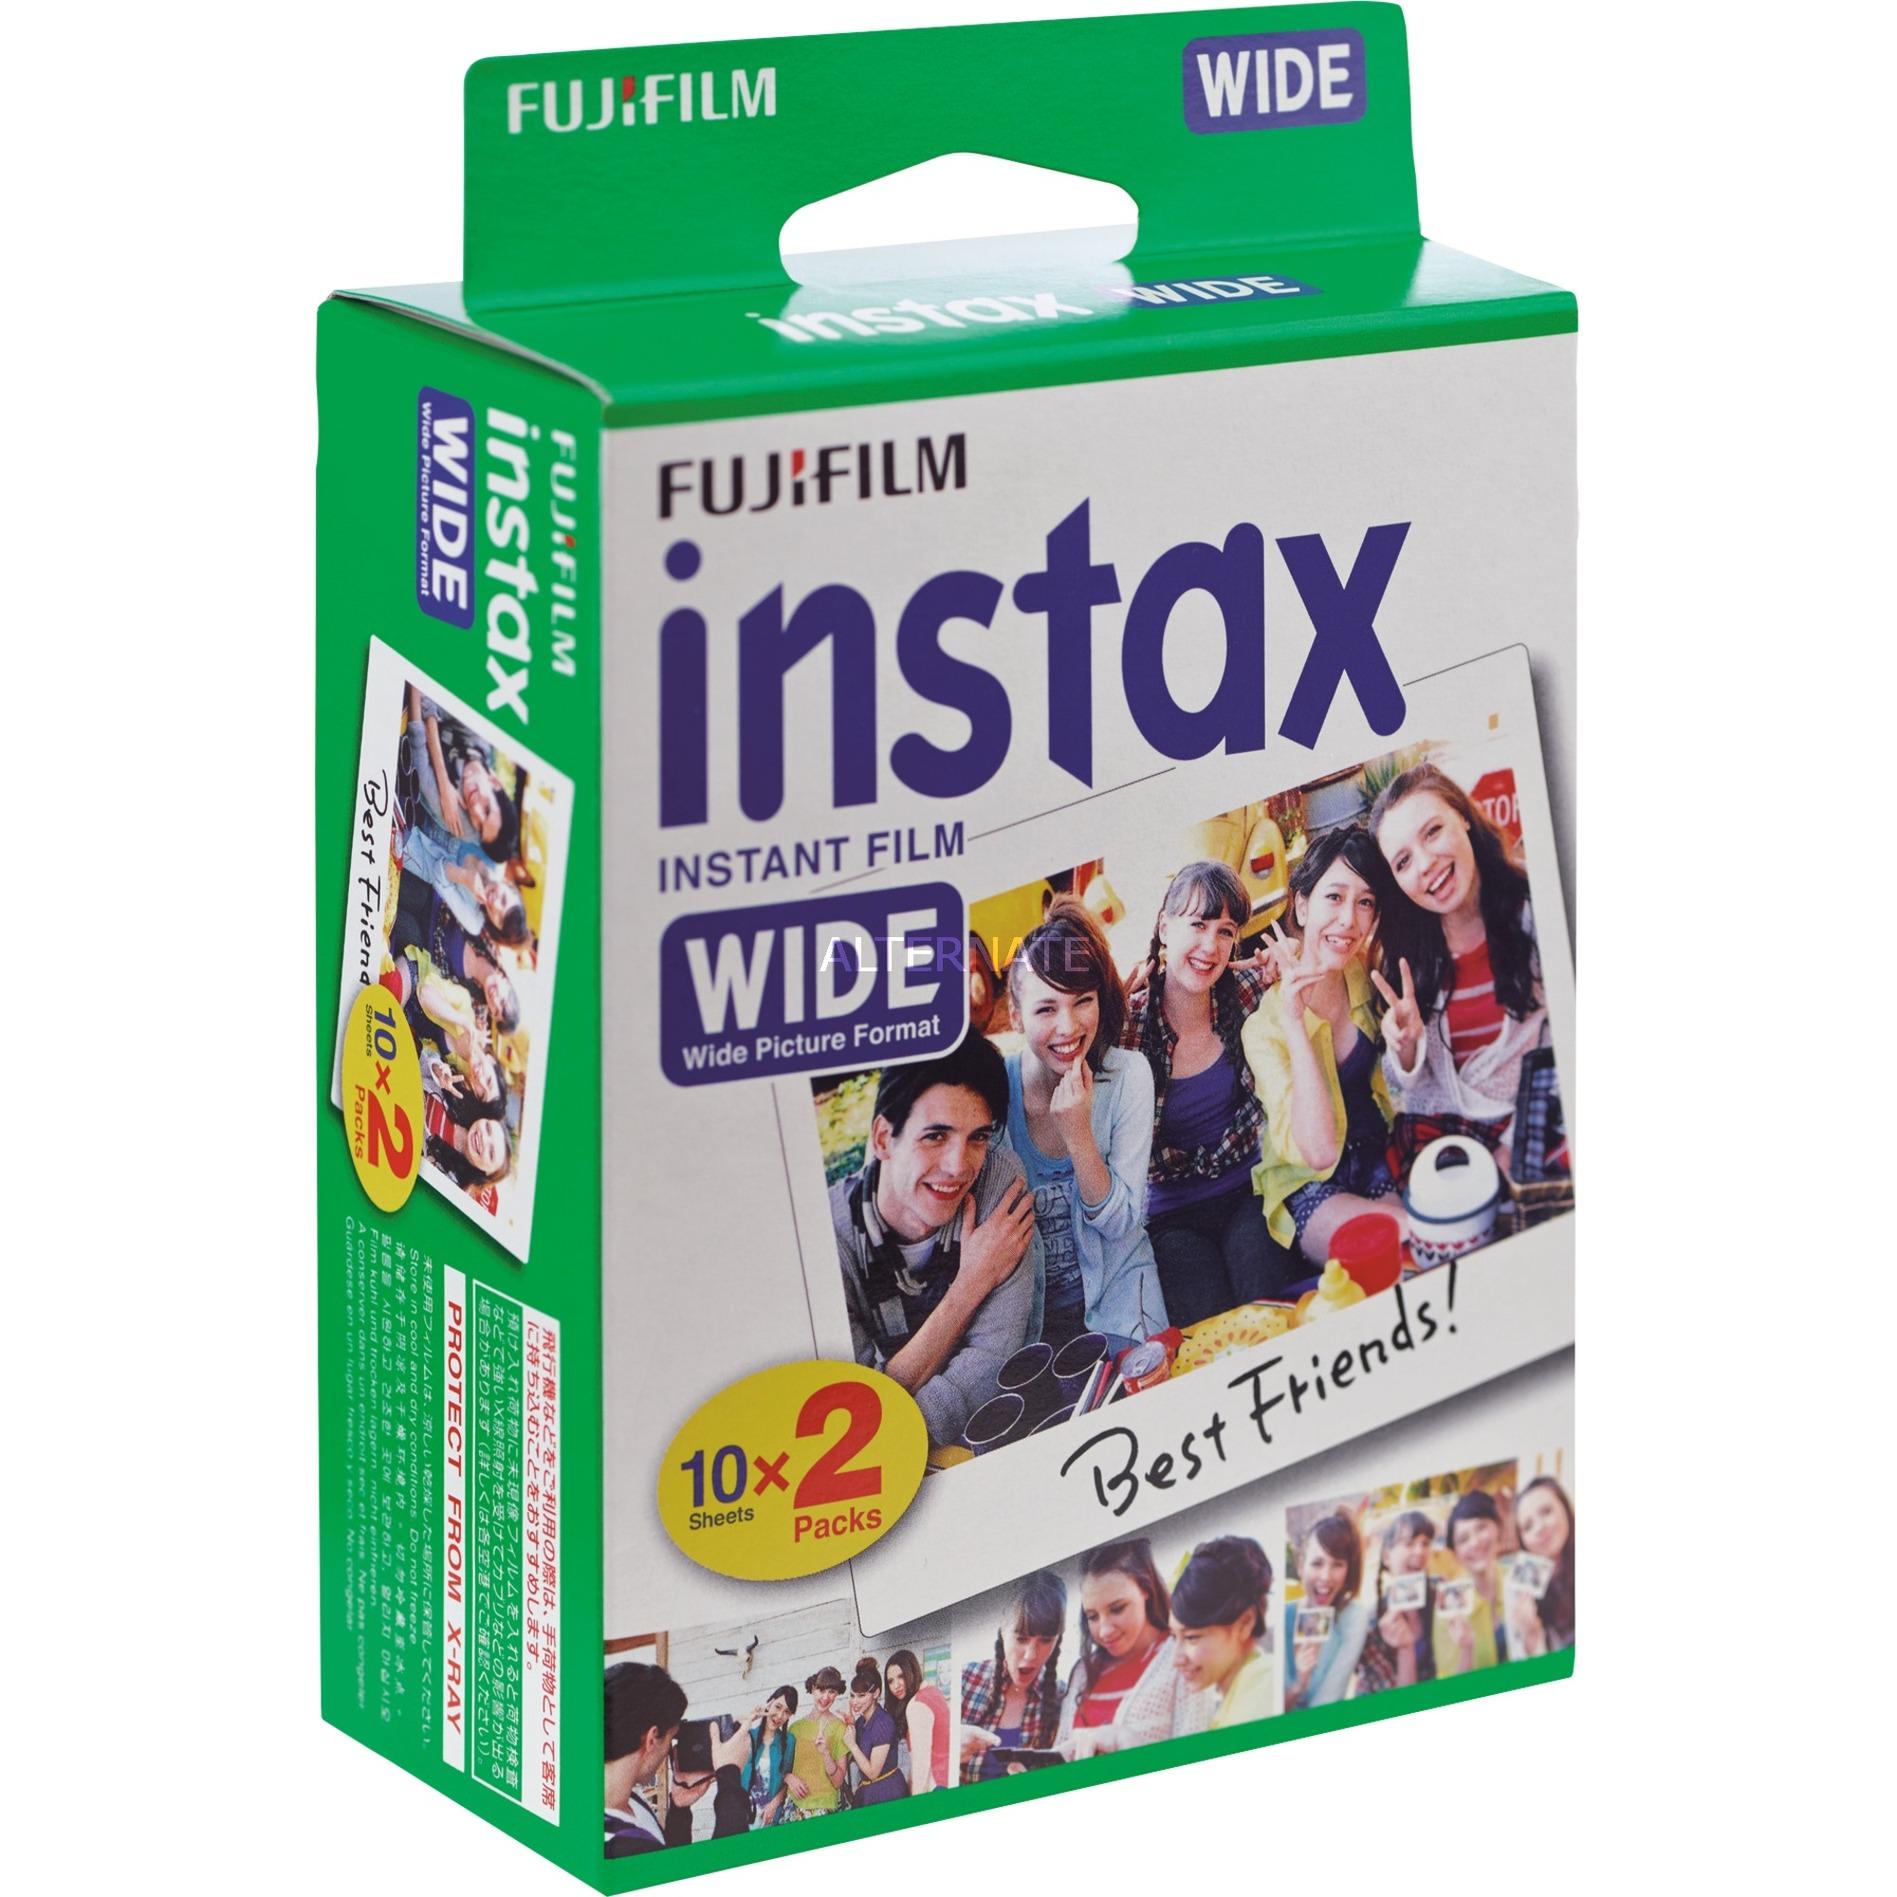 Instax Wide Film 20pieza(s) 108 x 86mm película instantáneas, Papel fotográfico